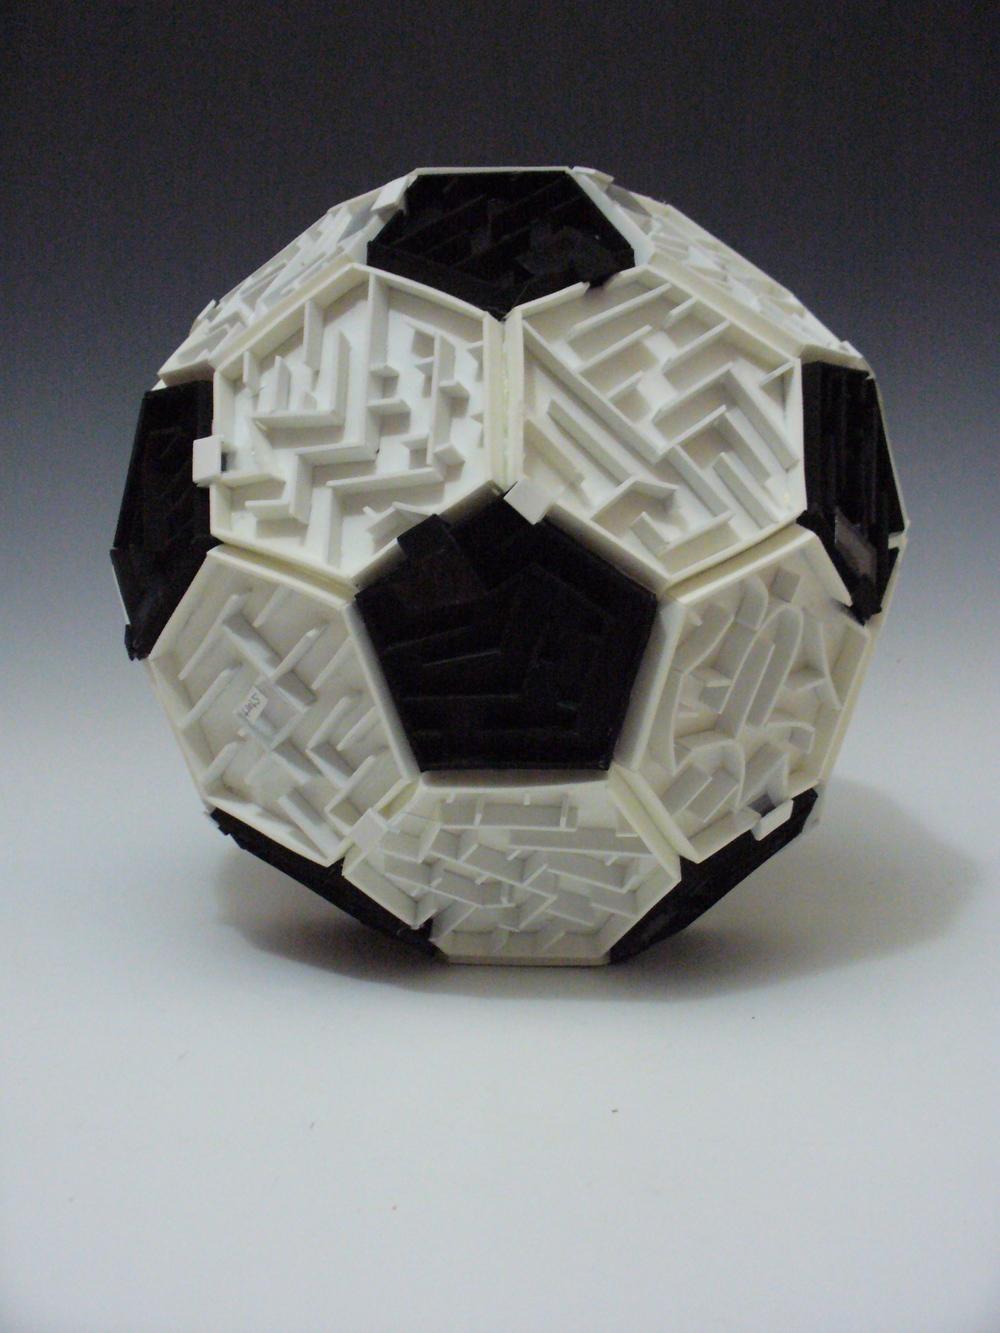 Soccerball copy.JPG